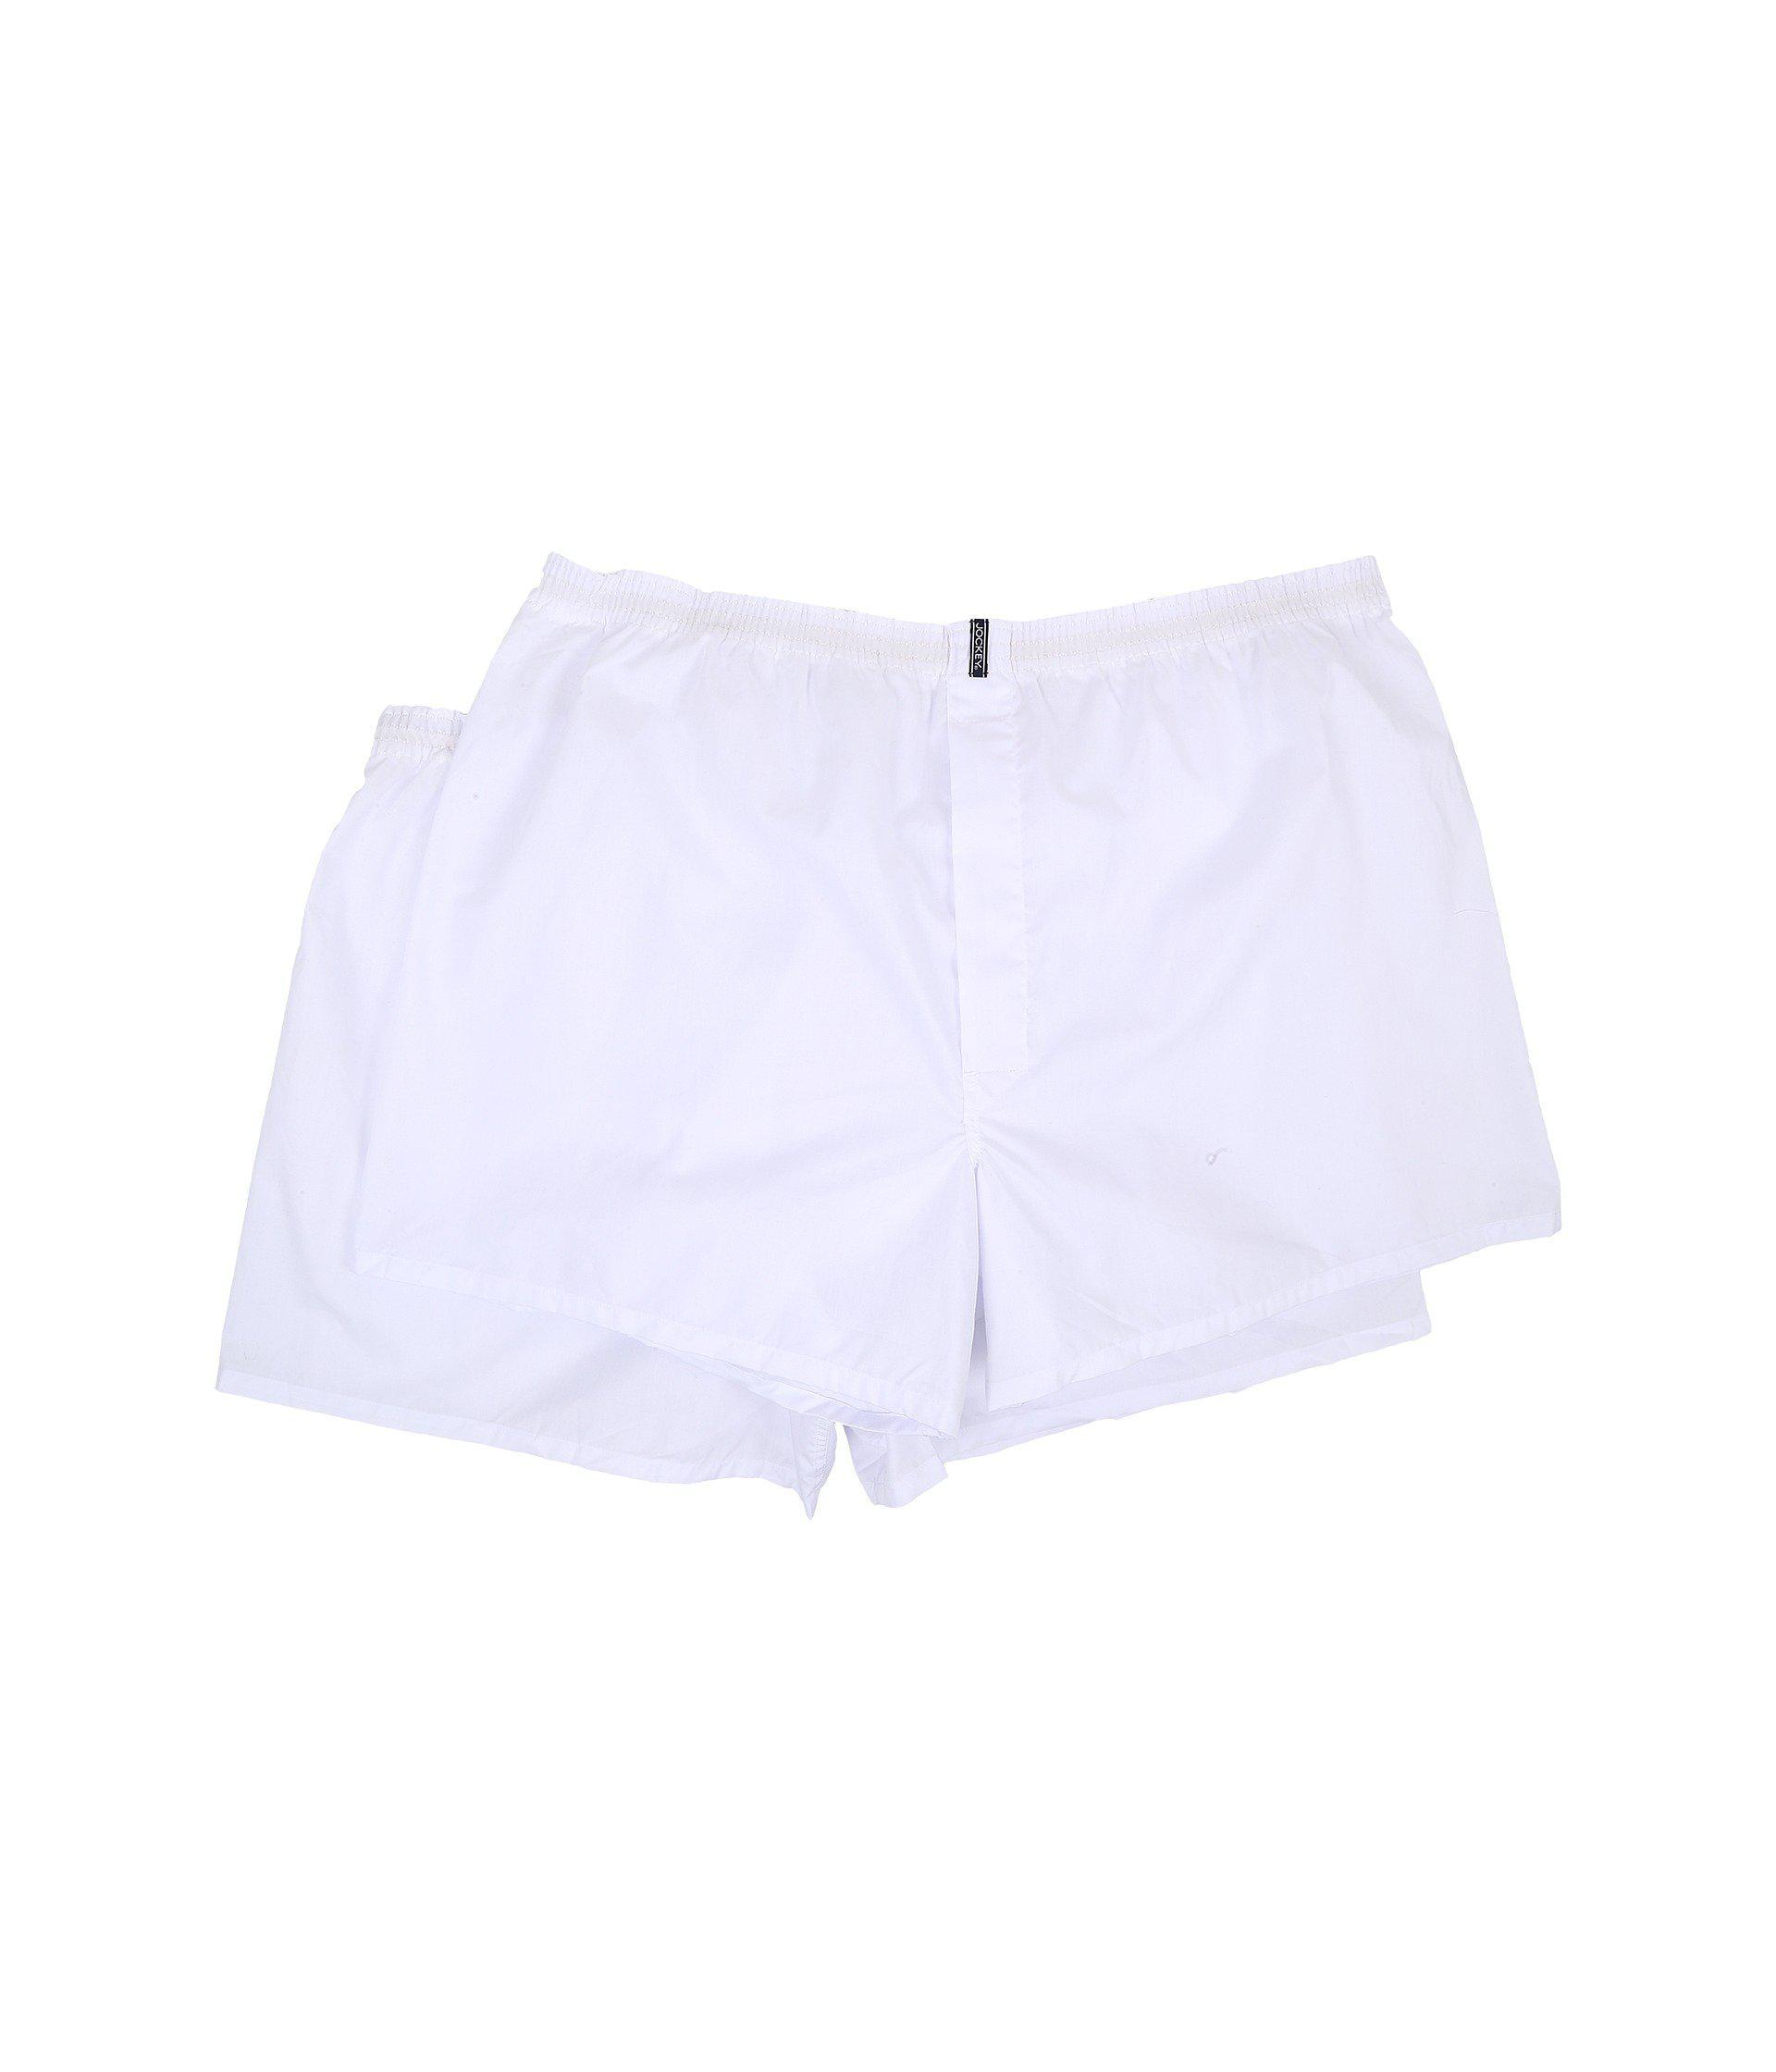 c0736c2069a4 2 Pack Big & Tall Jockey Mens Underwear Big Man Classic Boxer Brief